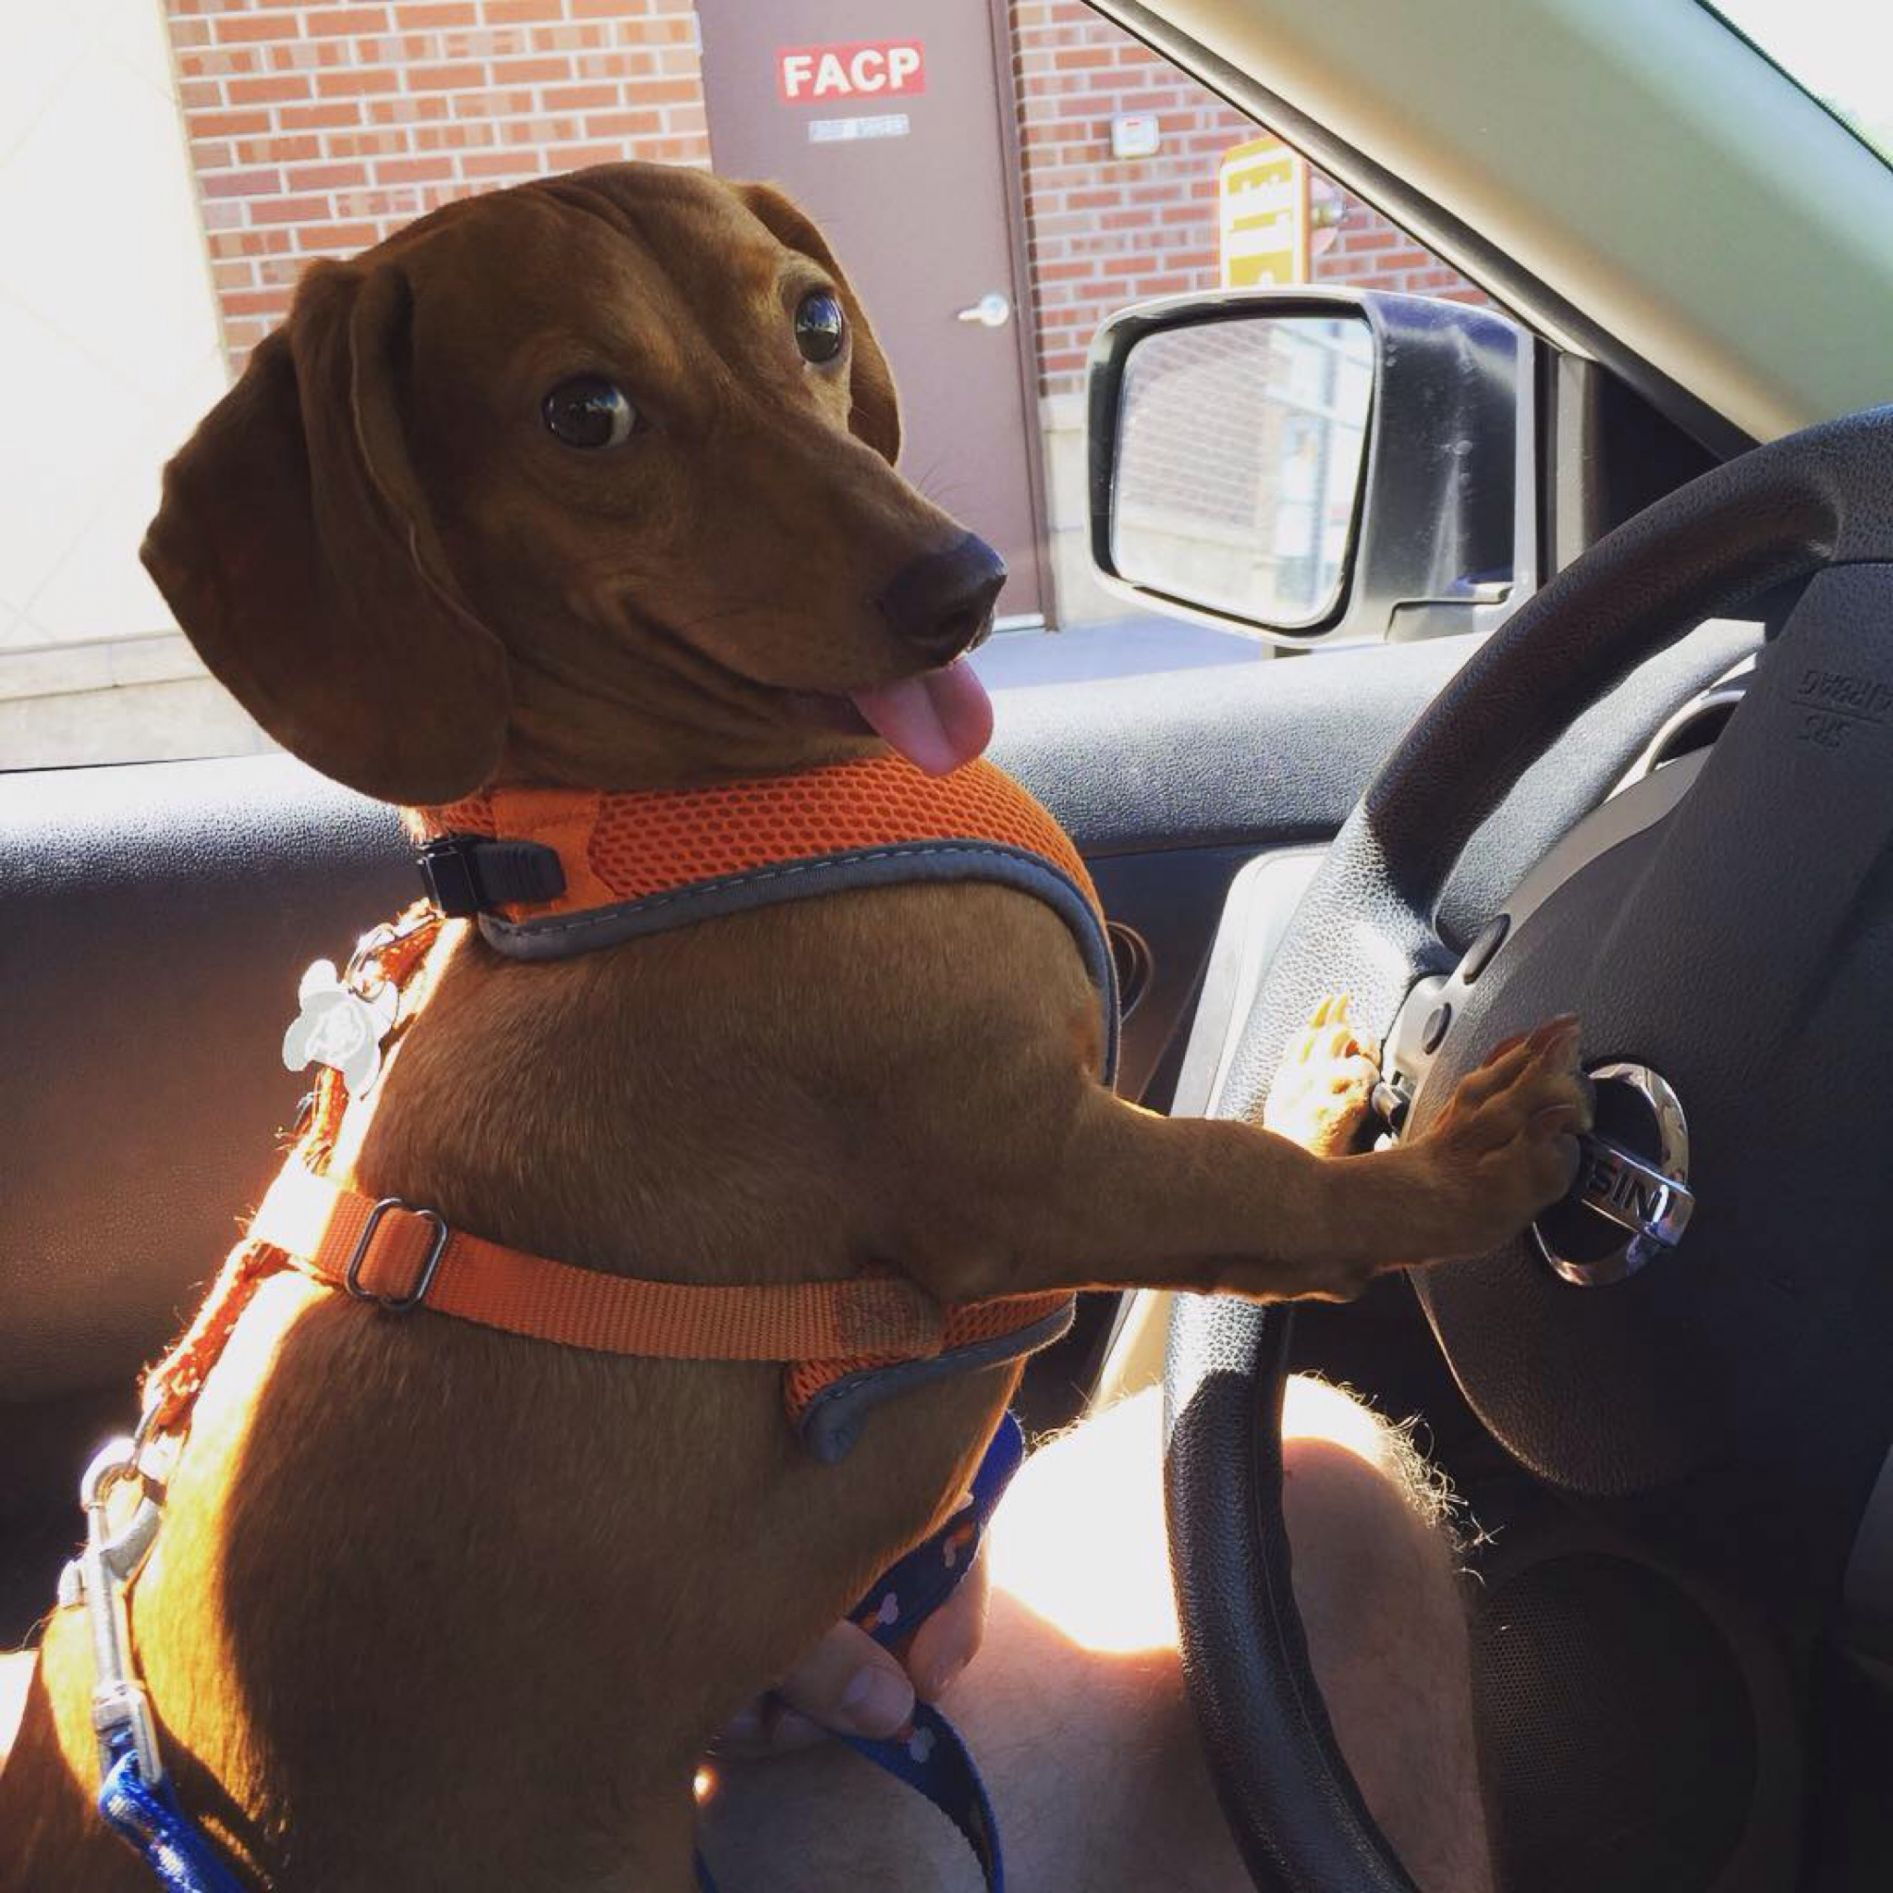 p7fqp wiener dog in car blank template imgflip